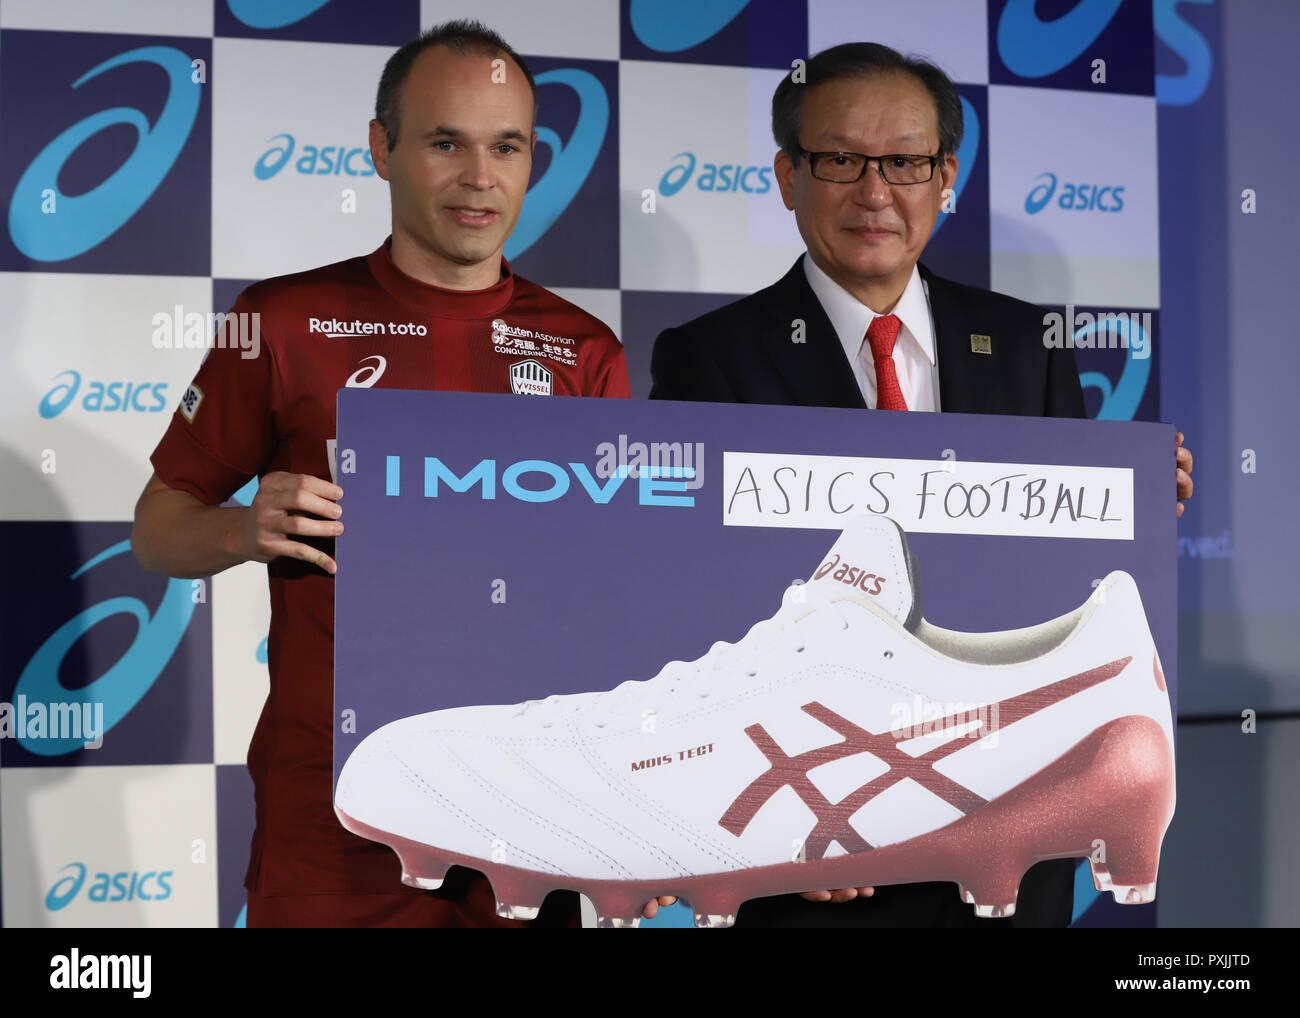 asics football japan